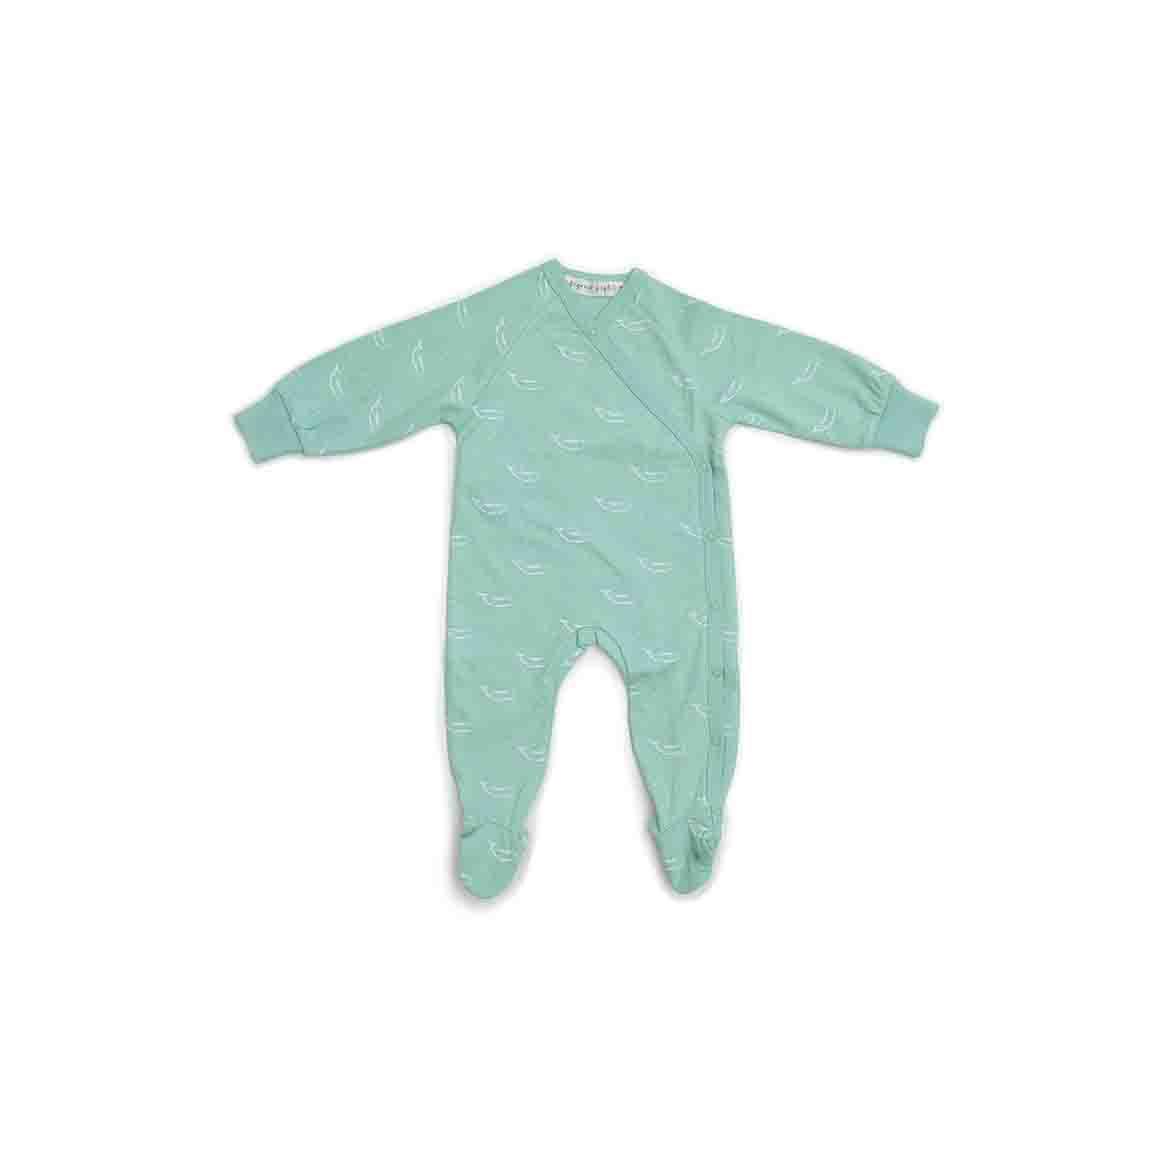 Baby Sleepsuit Kimono With Feet (Sage Green - Tiny Whales Print)   Trada Marketplace